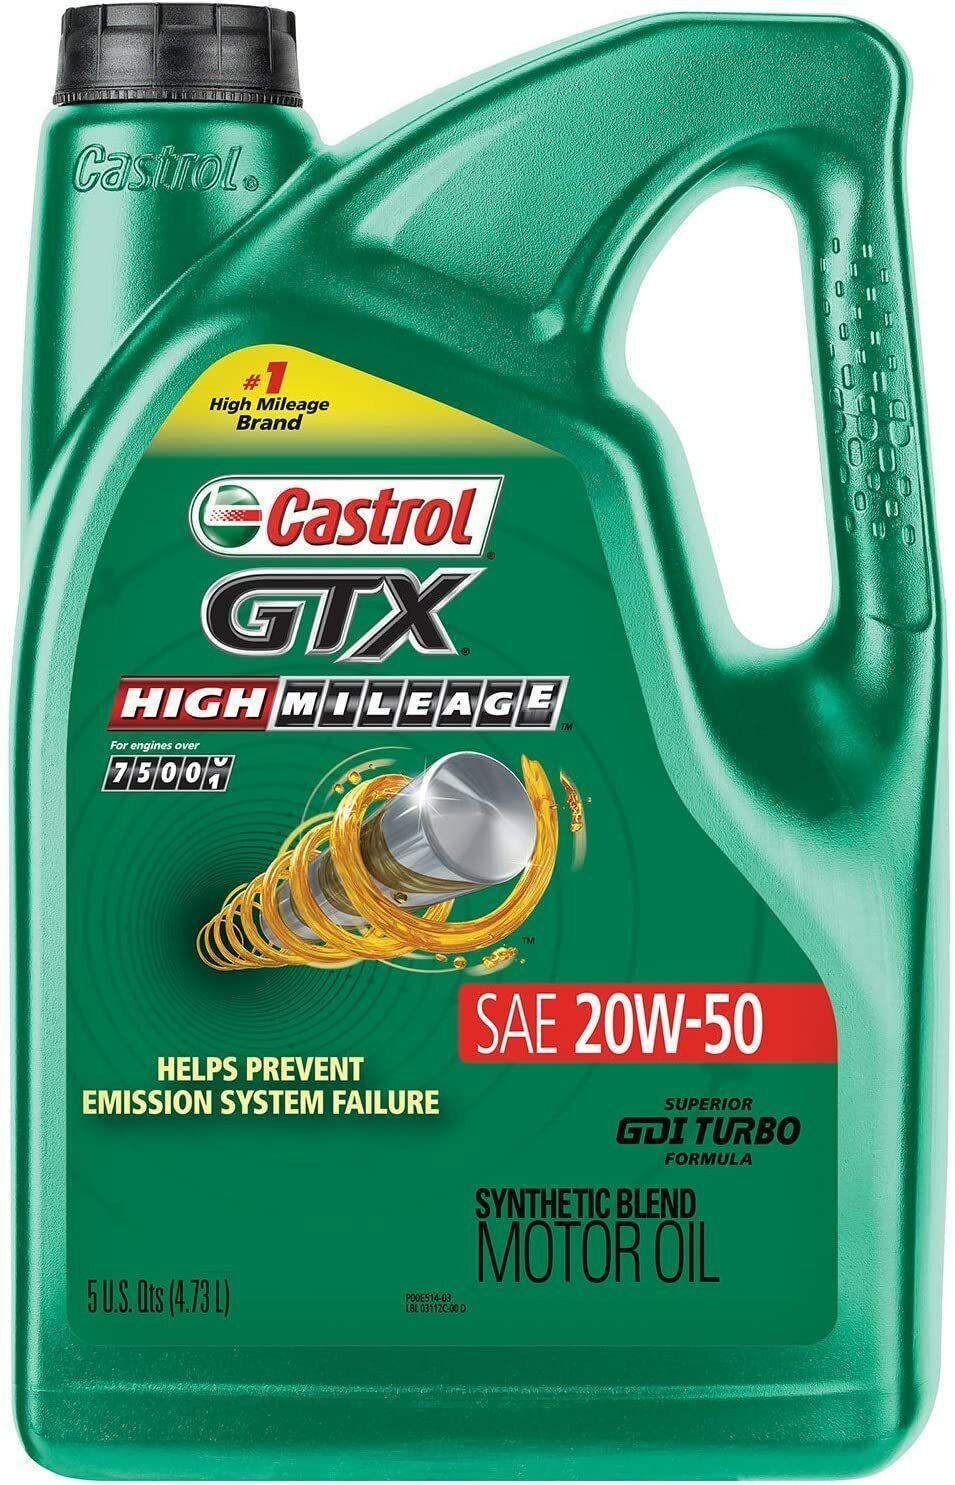 Castrol 03112 GTX High Mileage 20W-50 Synthetic Blend Motor Oil, 5 Quart